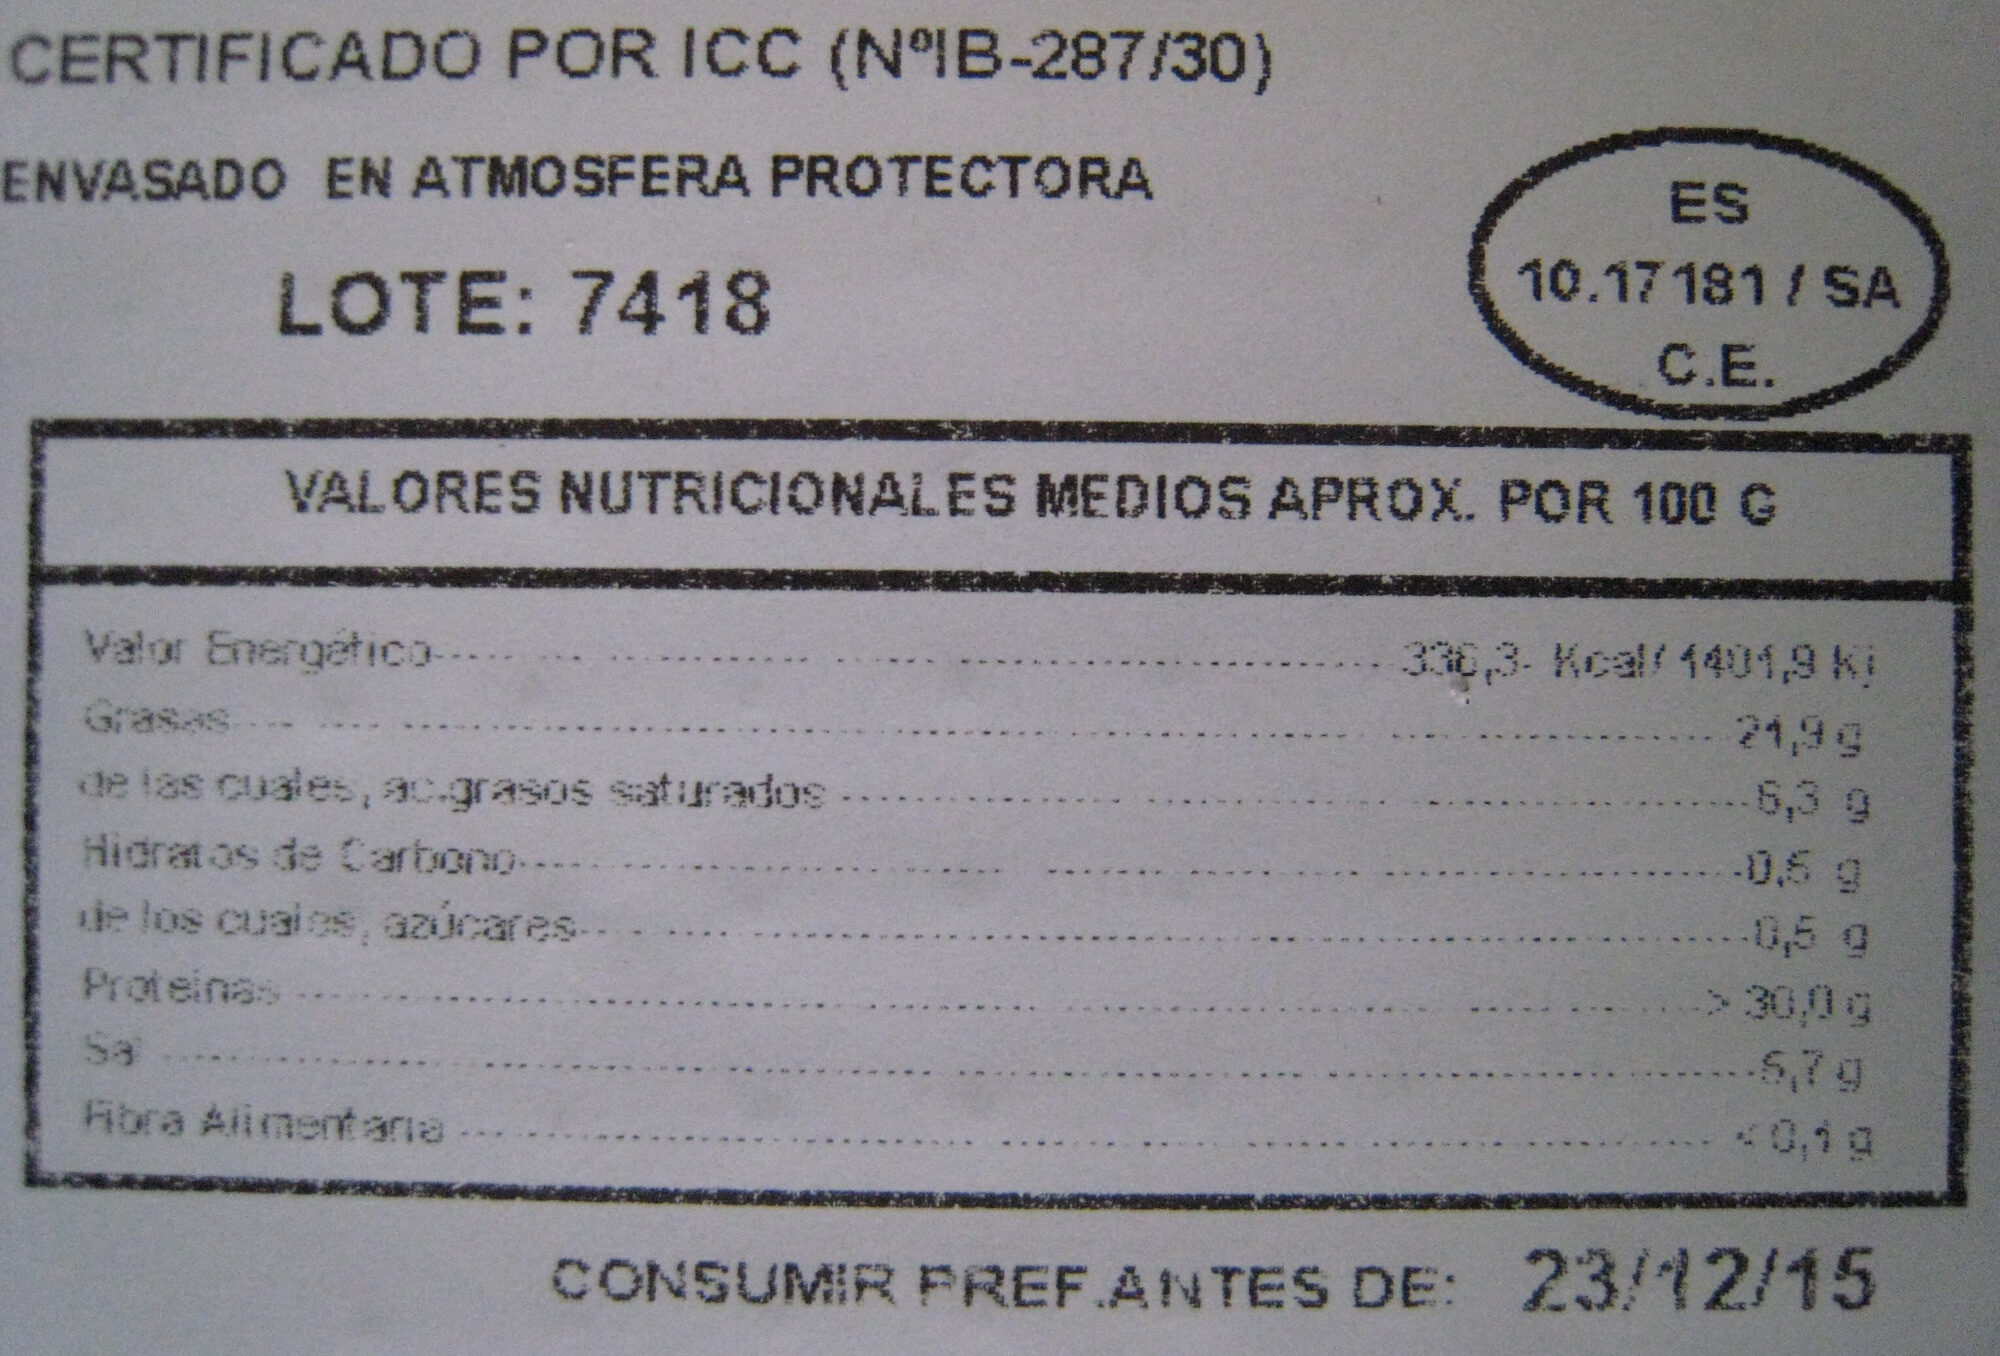 Jamón Ibérico 100 g de Bellota - Informations nutritionnelles - es